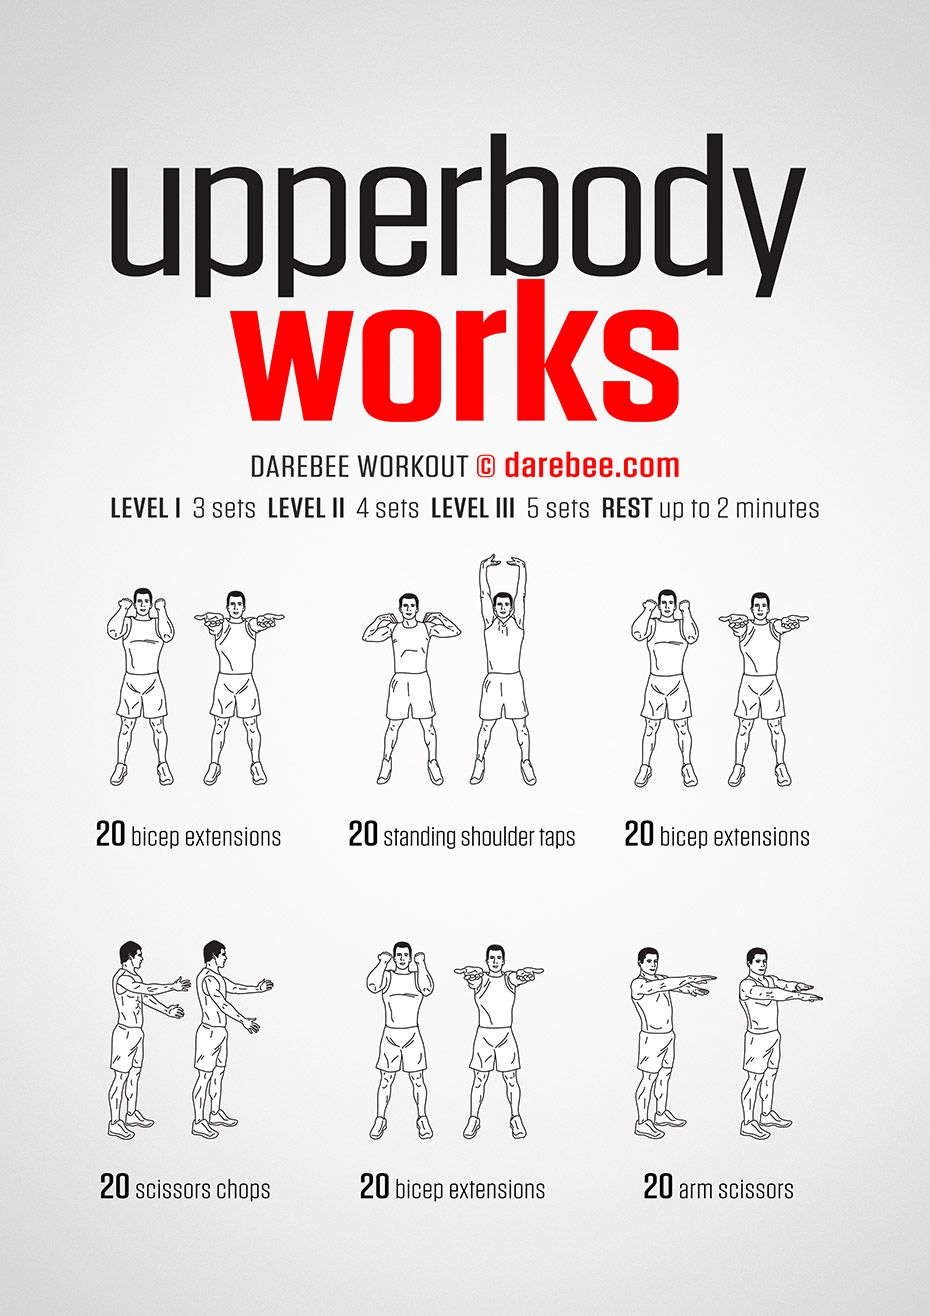 Upper Body Workout By Darebee Bodyweight Upper Body Workout Fitness Body Upper Body Workout